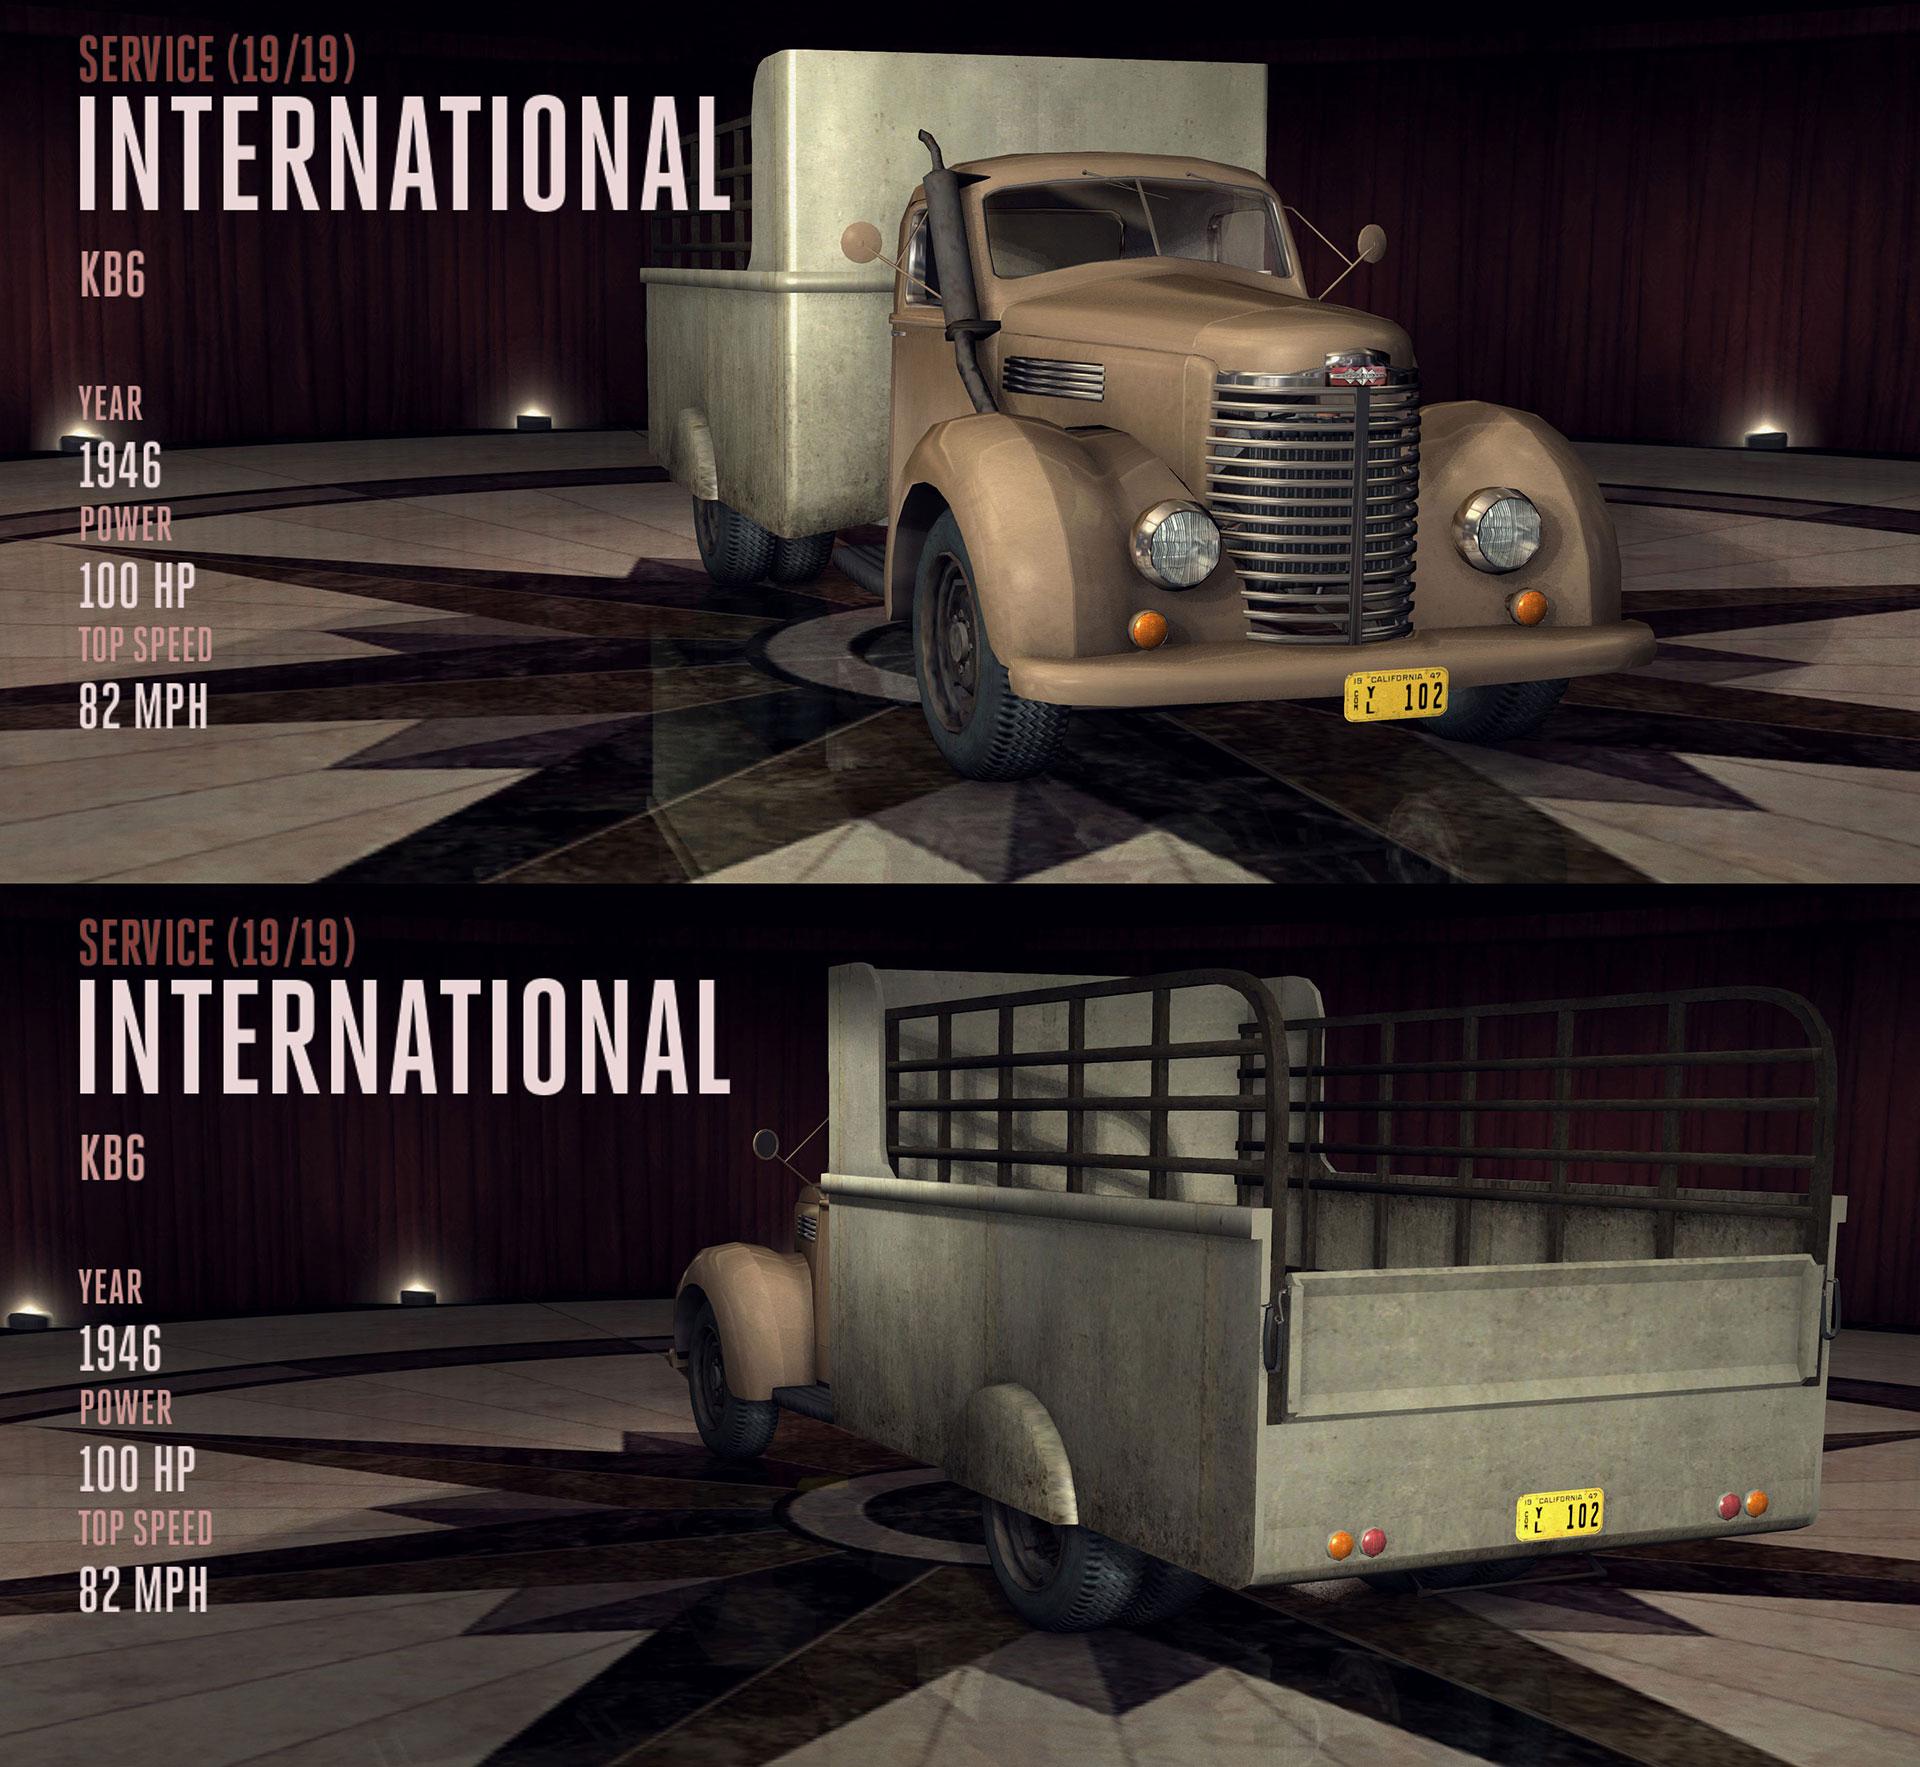 International KB6